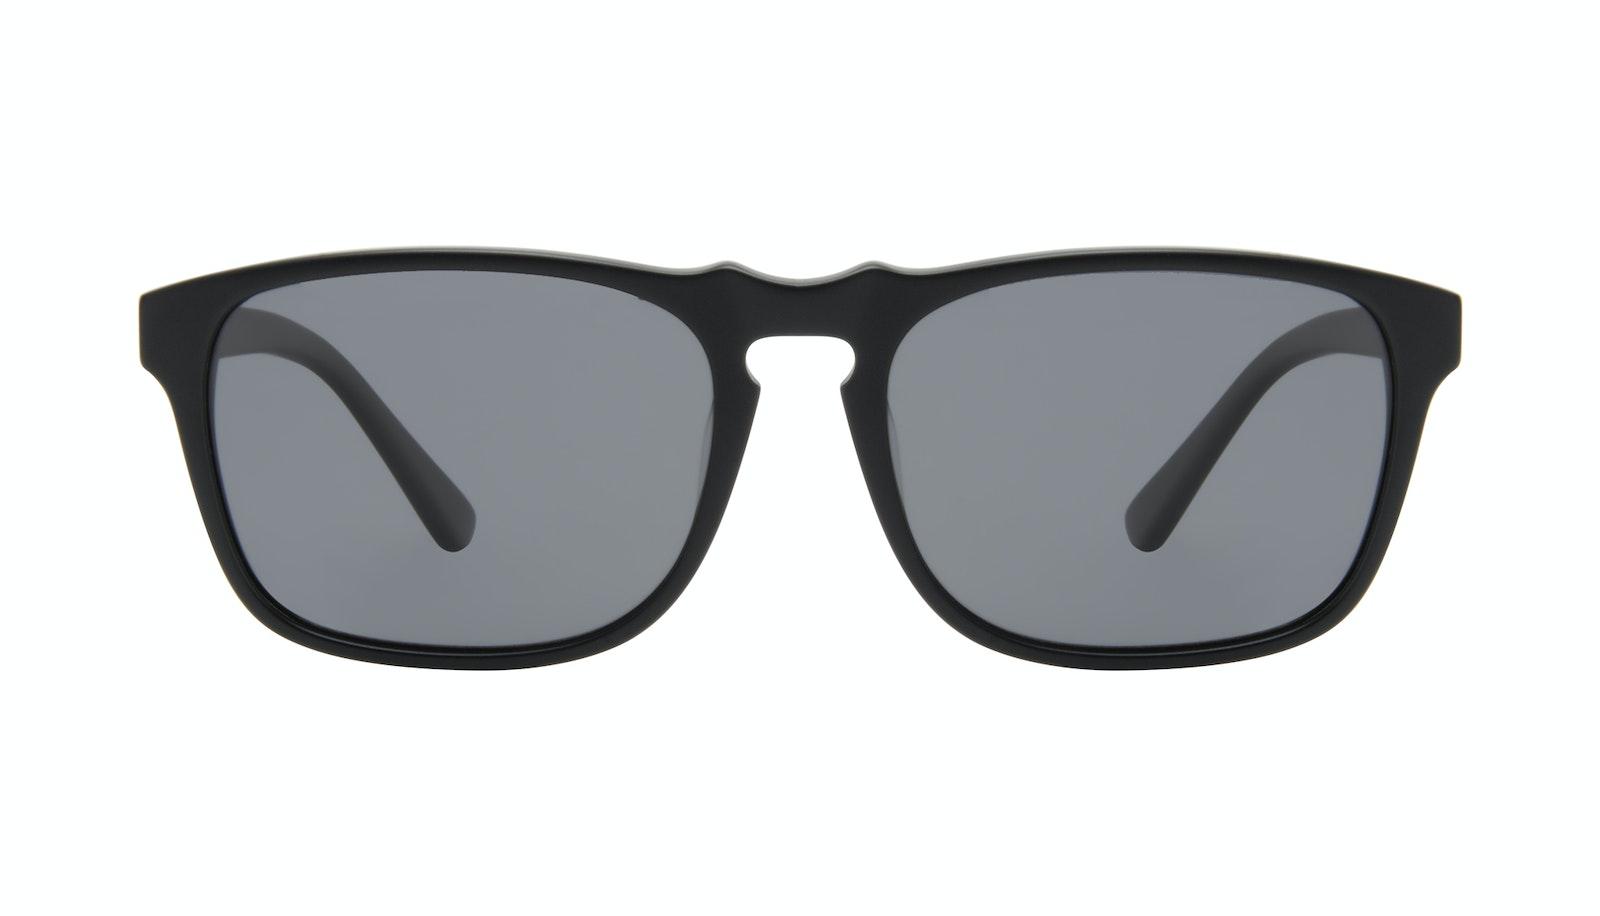 Affordable Fashion Glasses Square Sunglasses Men Raceway Onyx Matte